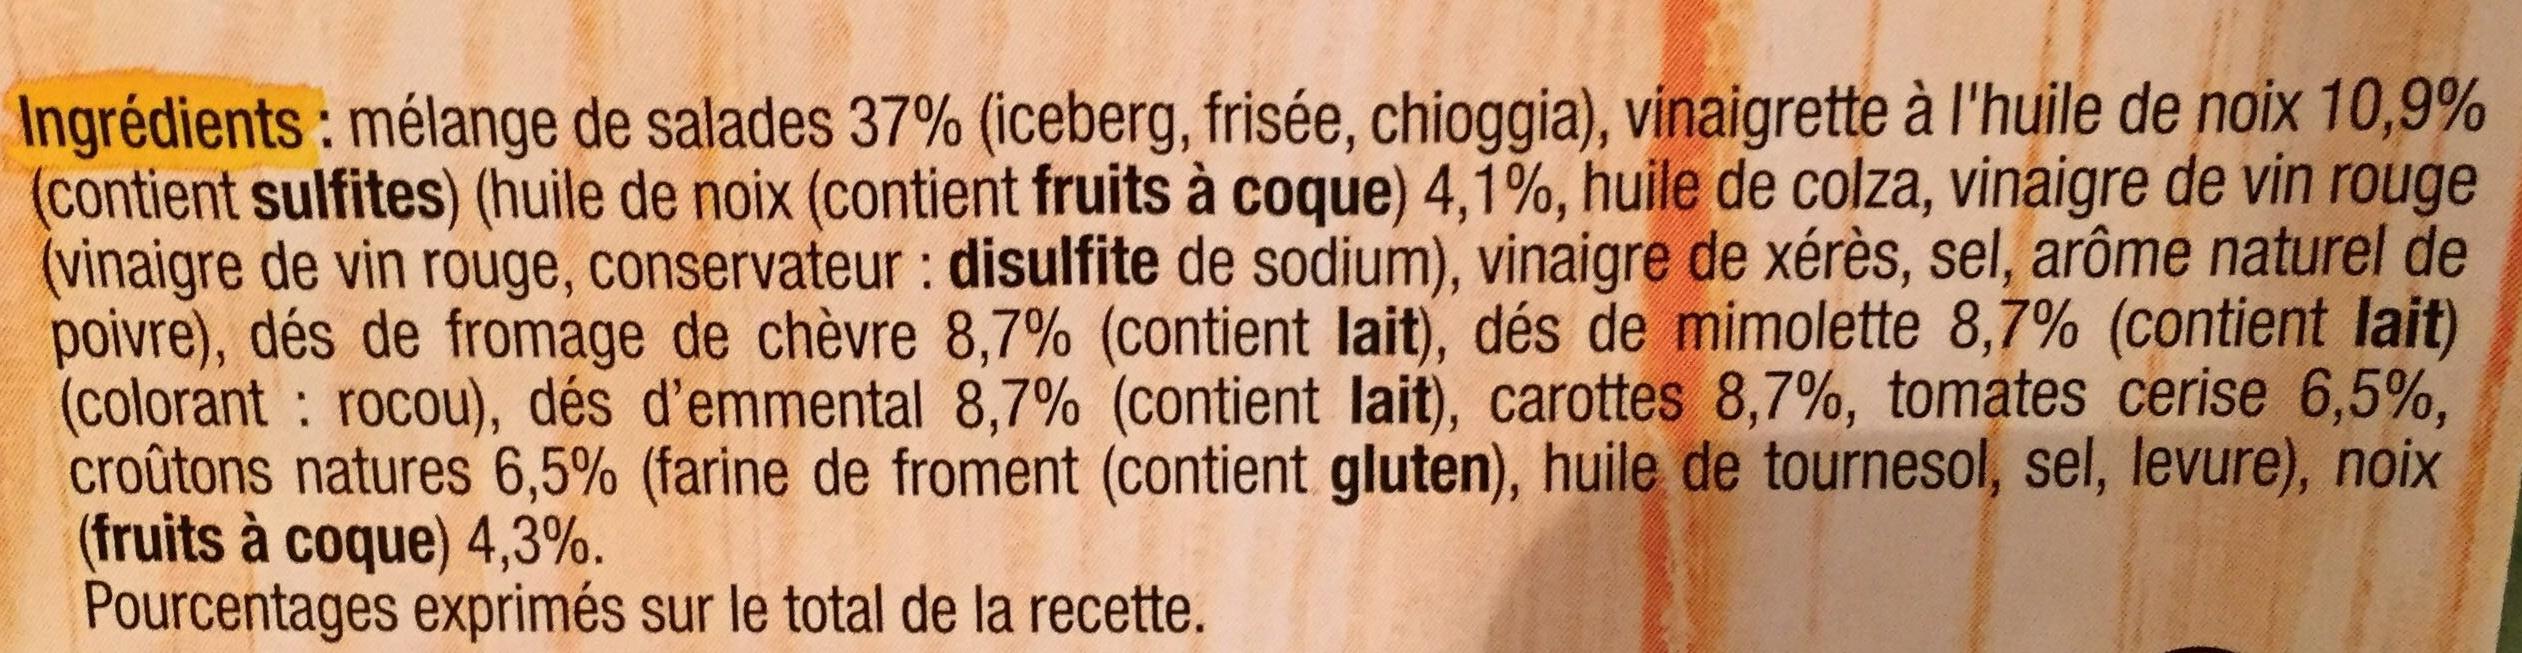 Pause snack Salade Fromagère - Ingrediënten - fr